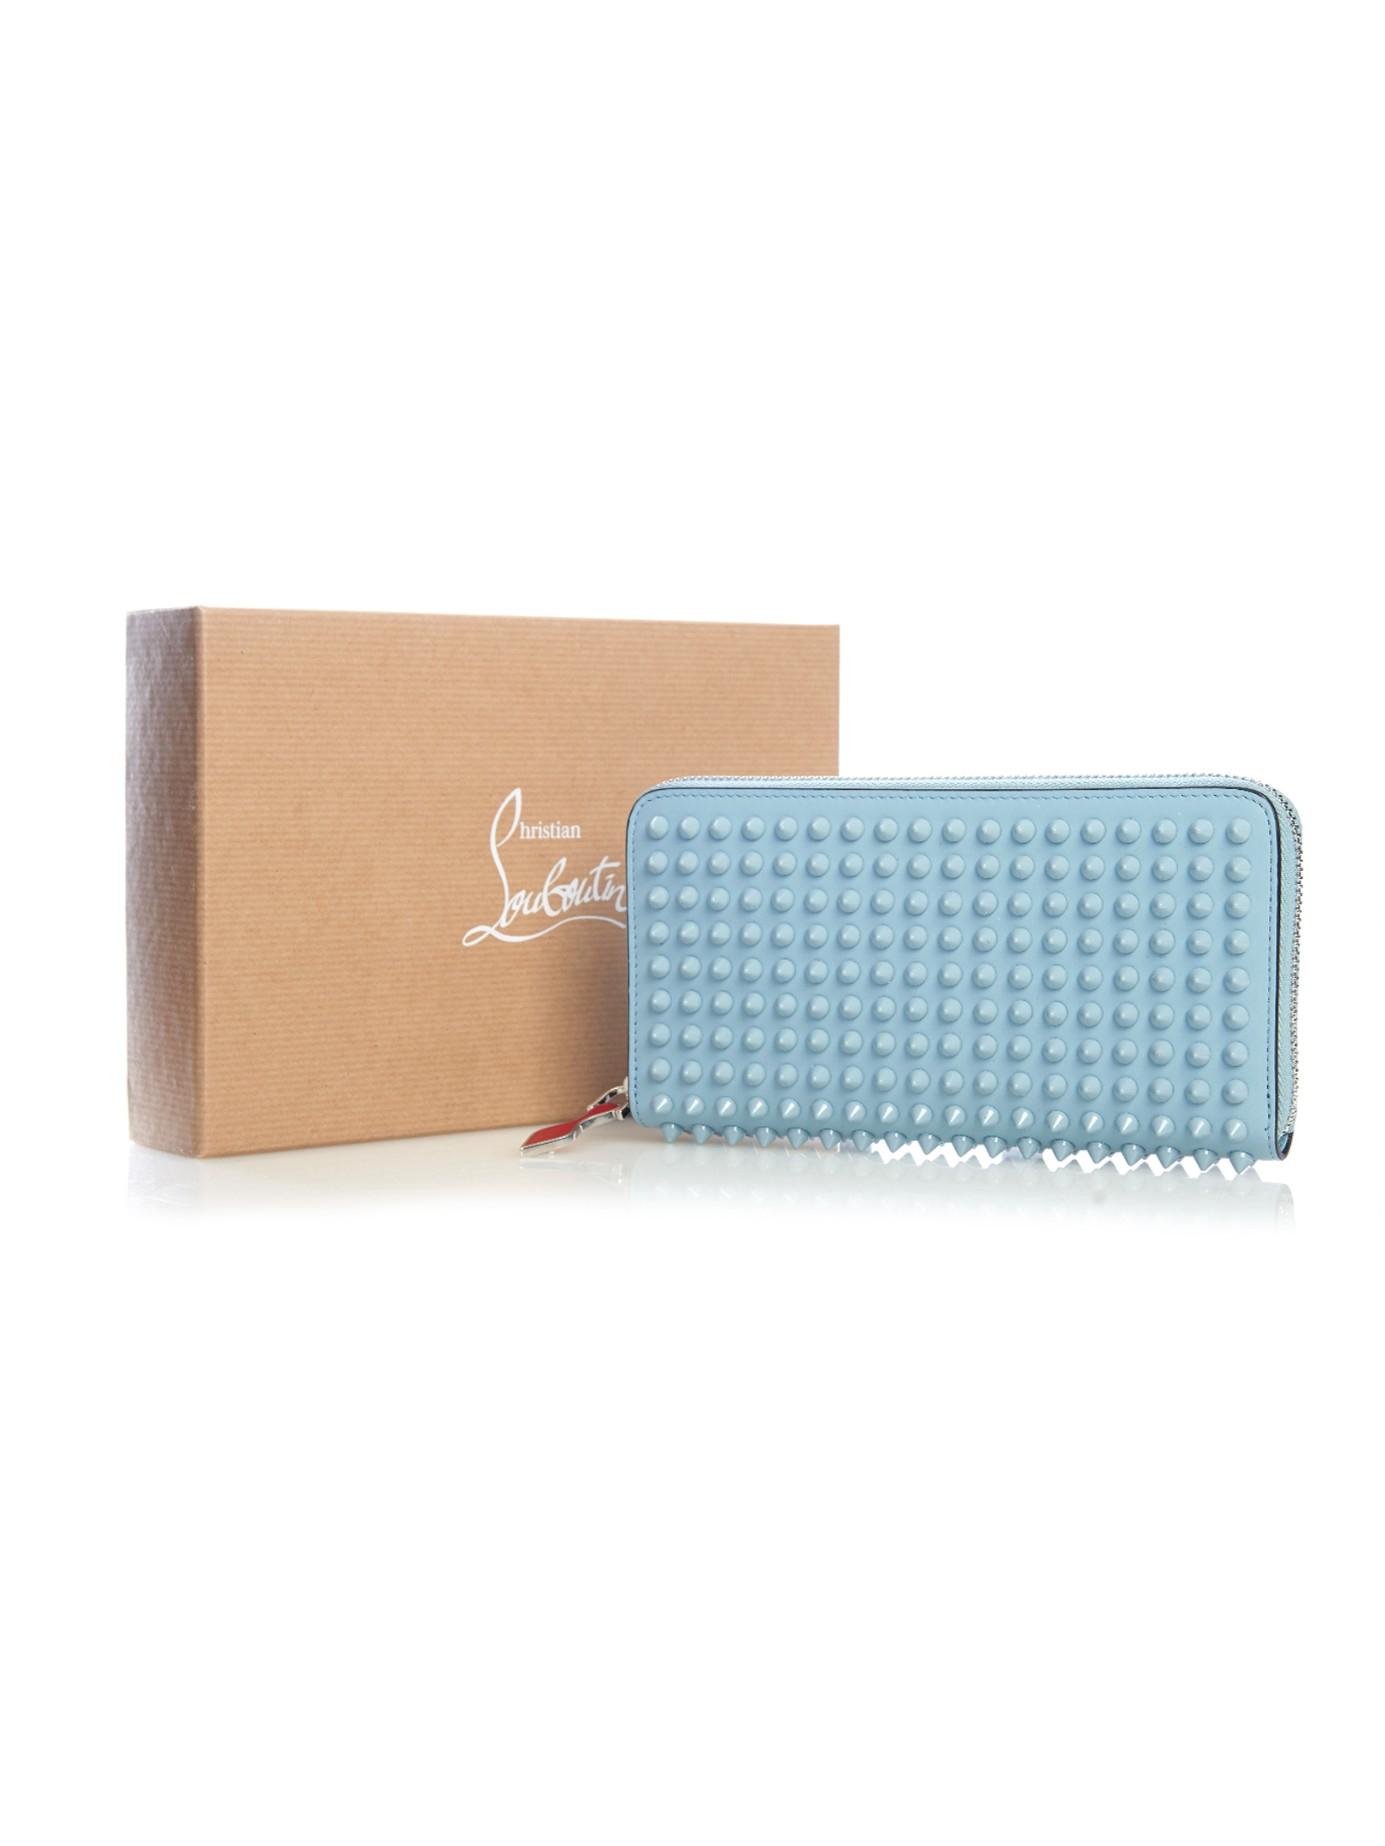 christian louboutin blue wallet